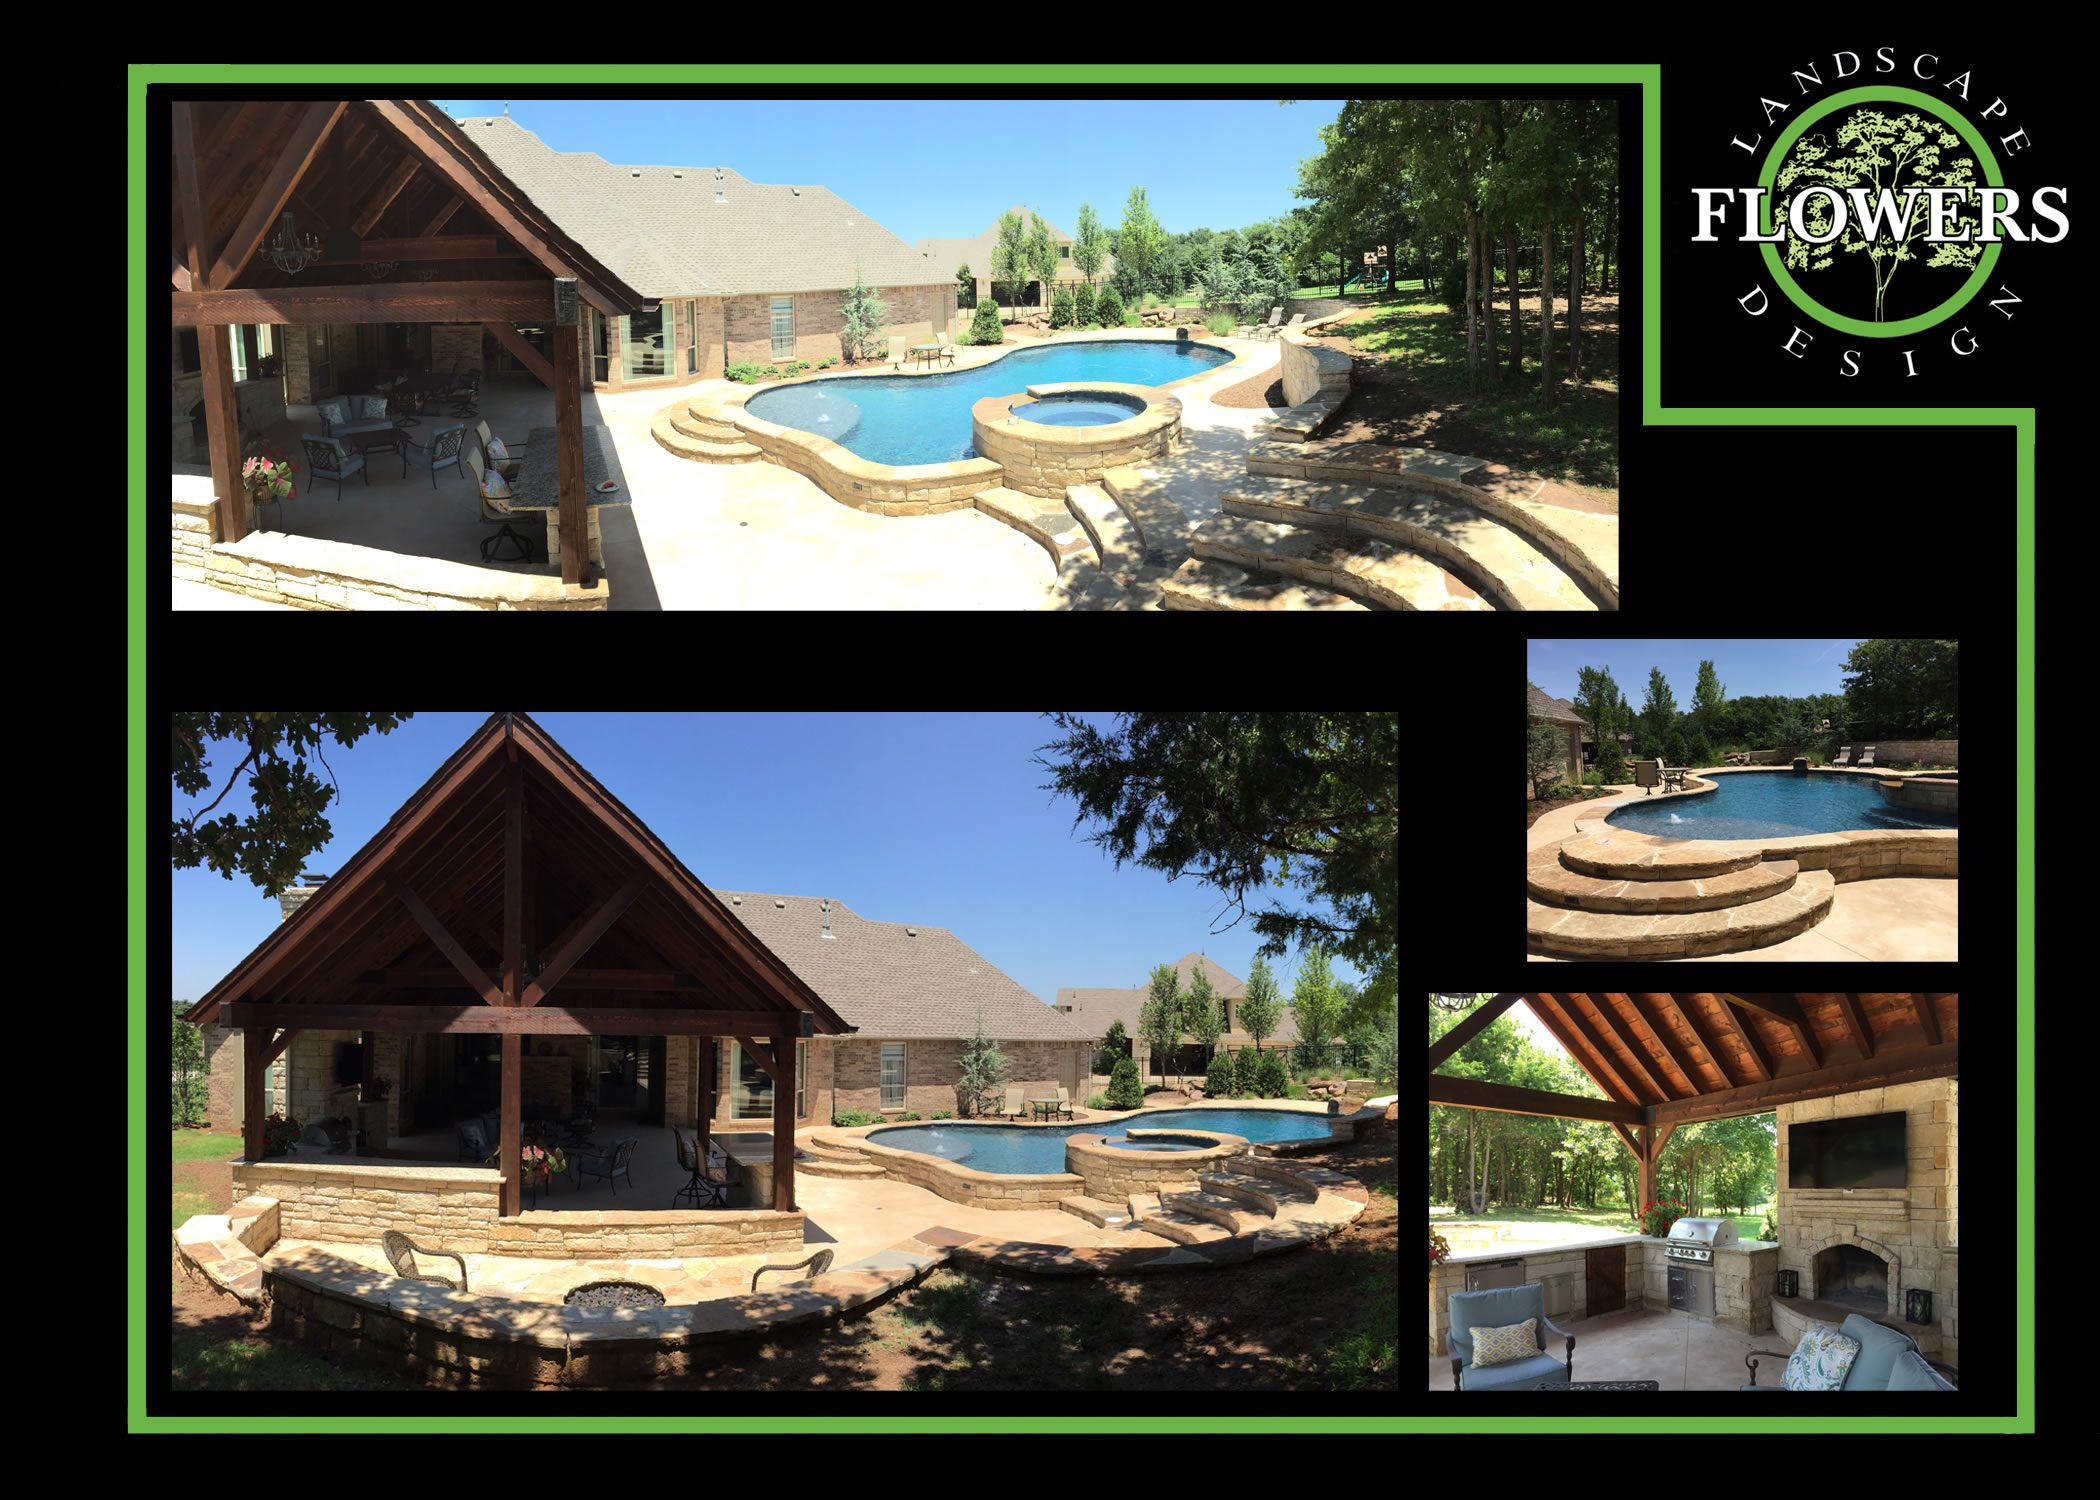 modern pool house and cabanas designs flowers landscape design